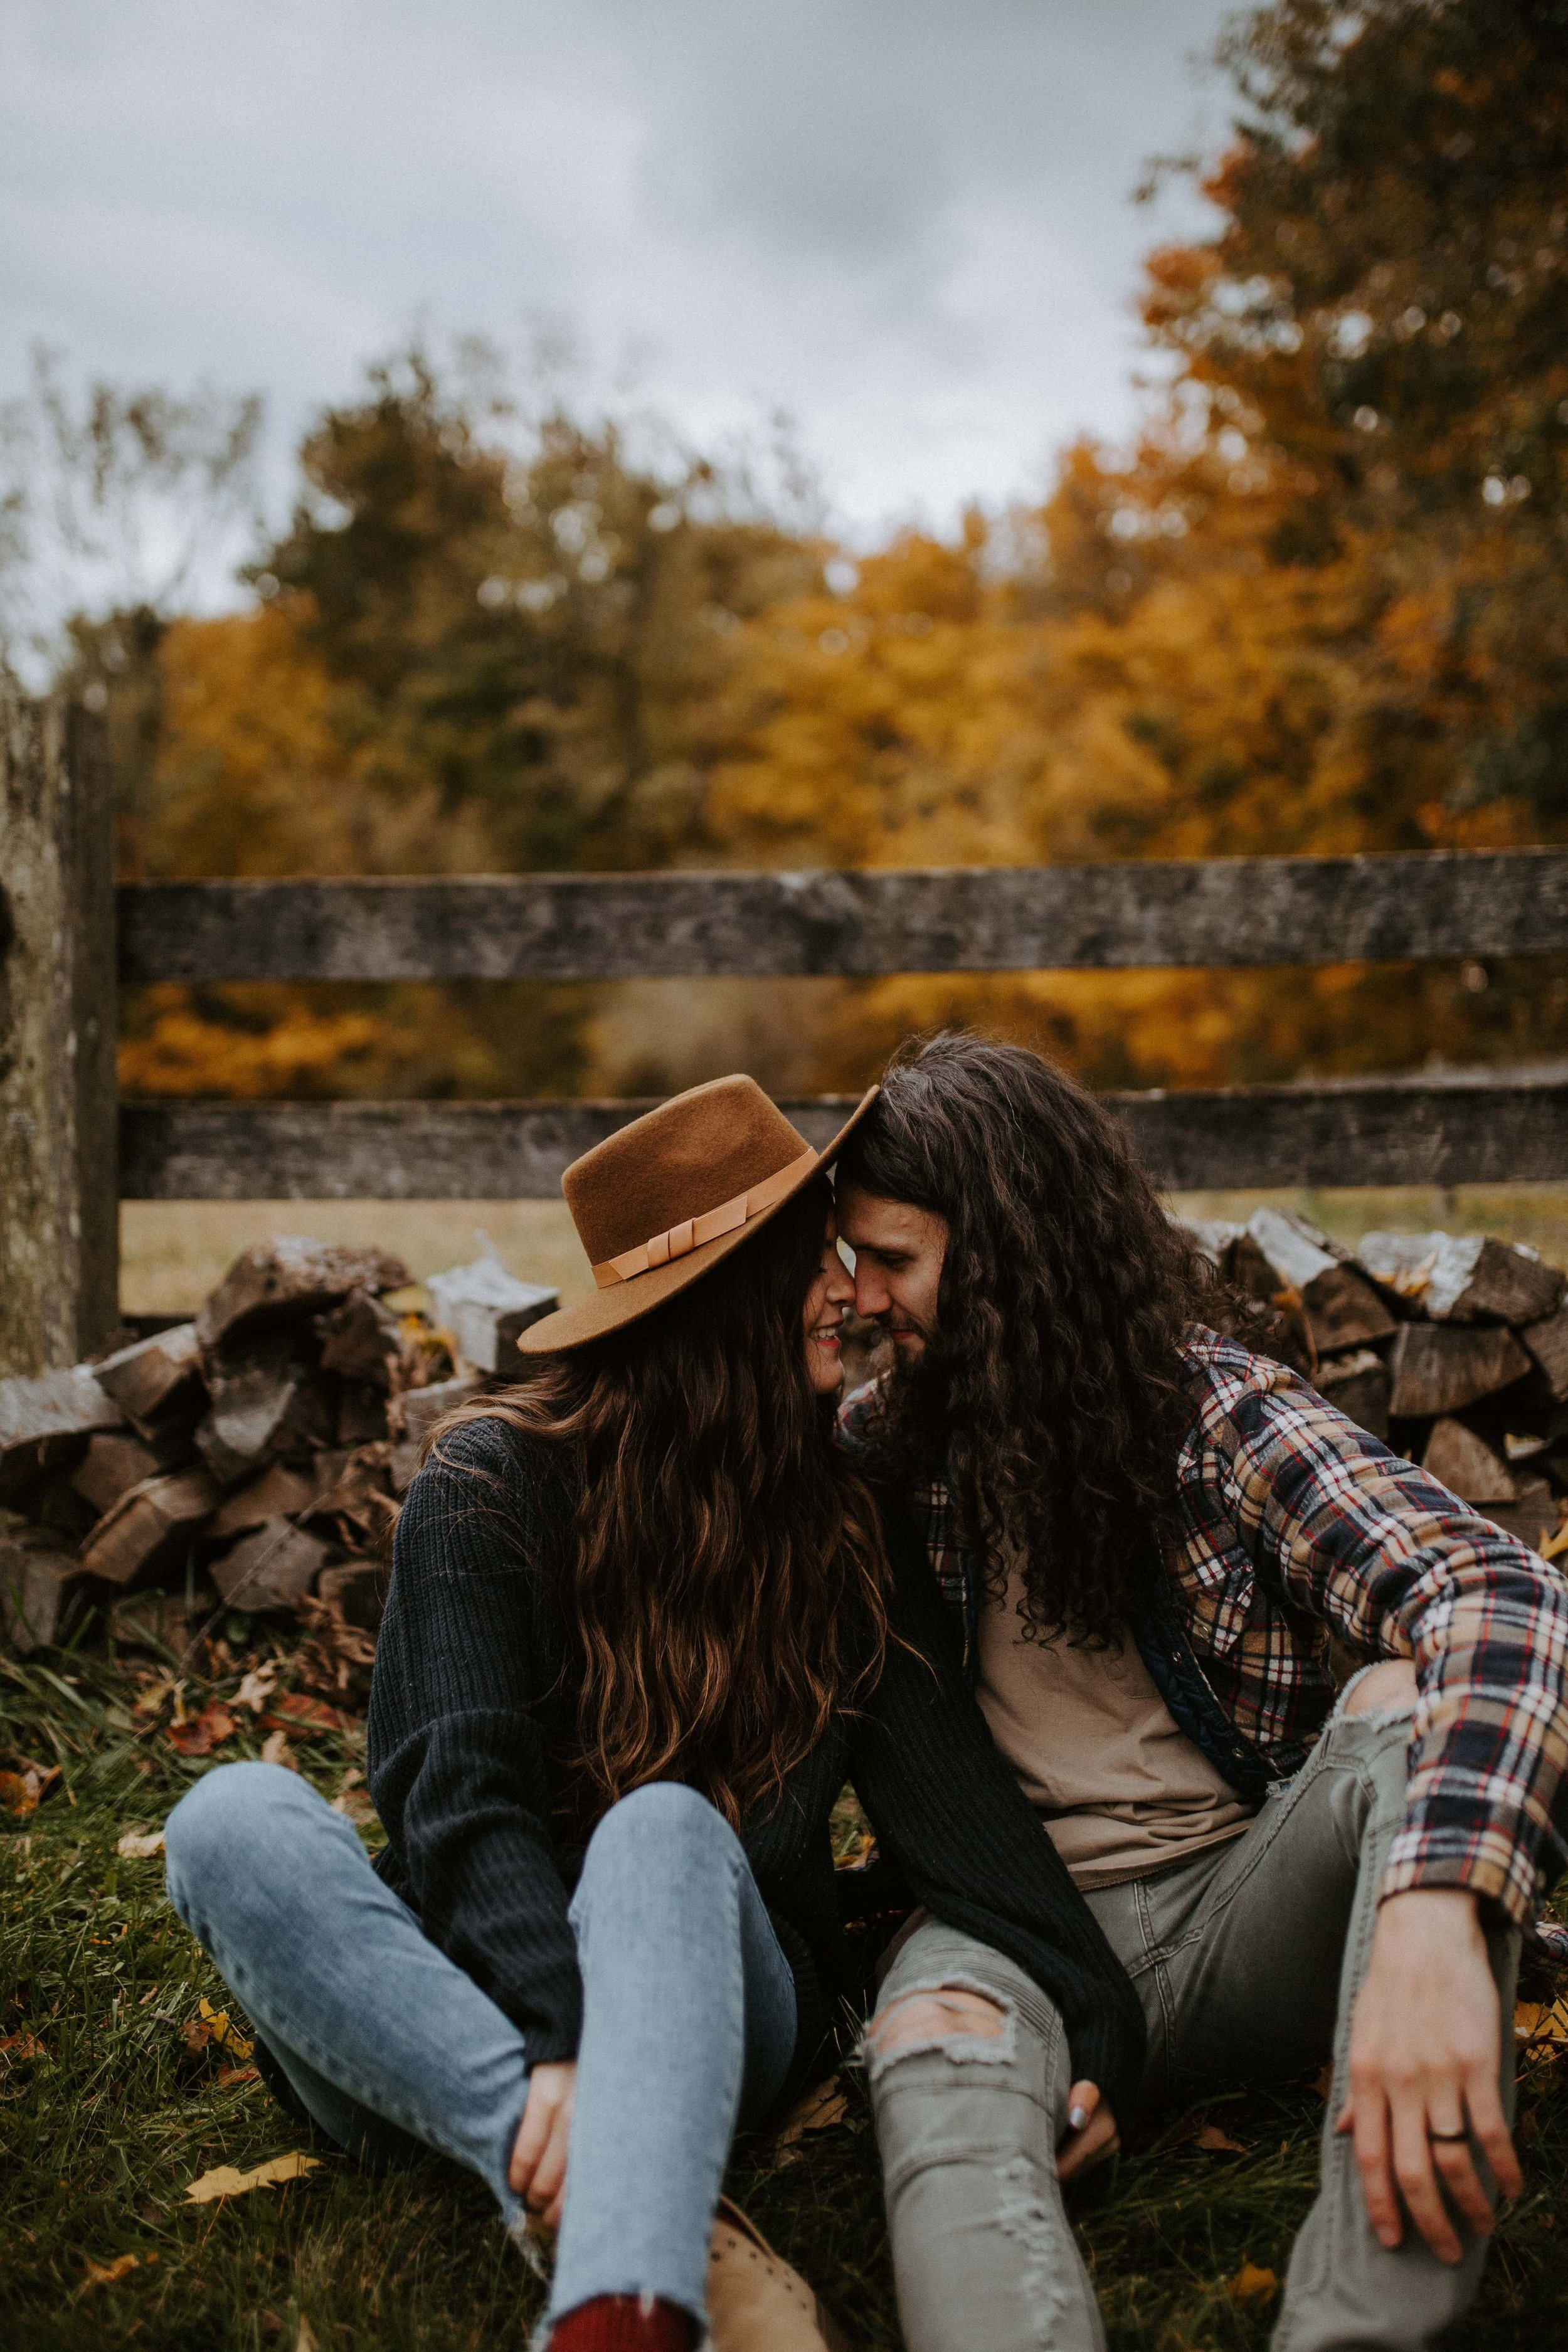 reaganlynnphotography-couplephotography-connerprairie-leximccracken25.jpg